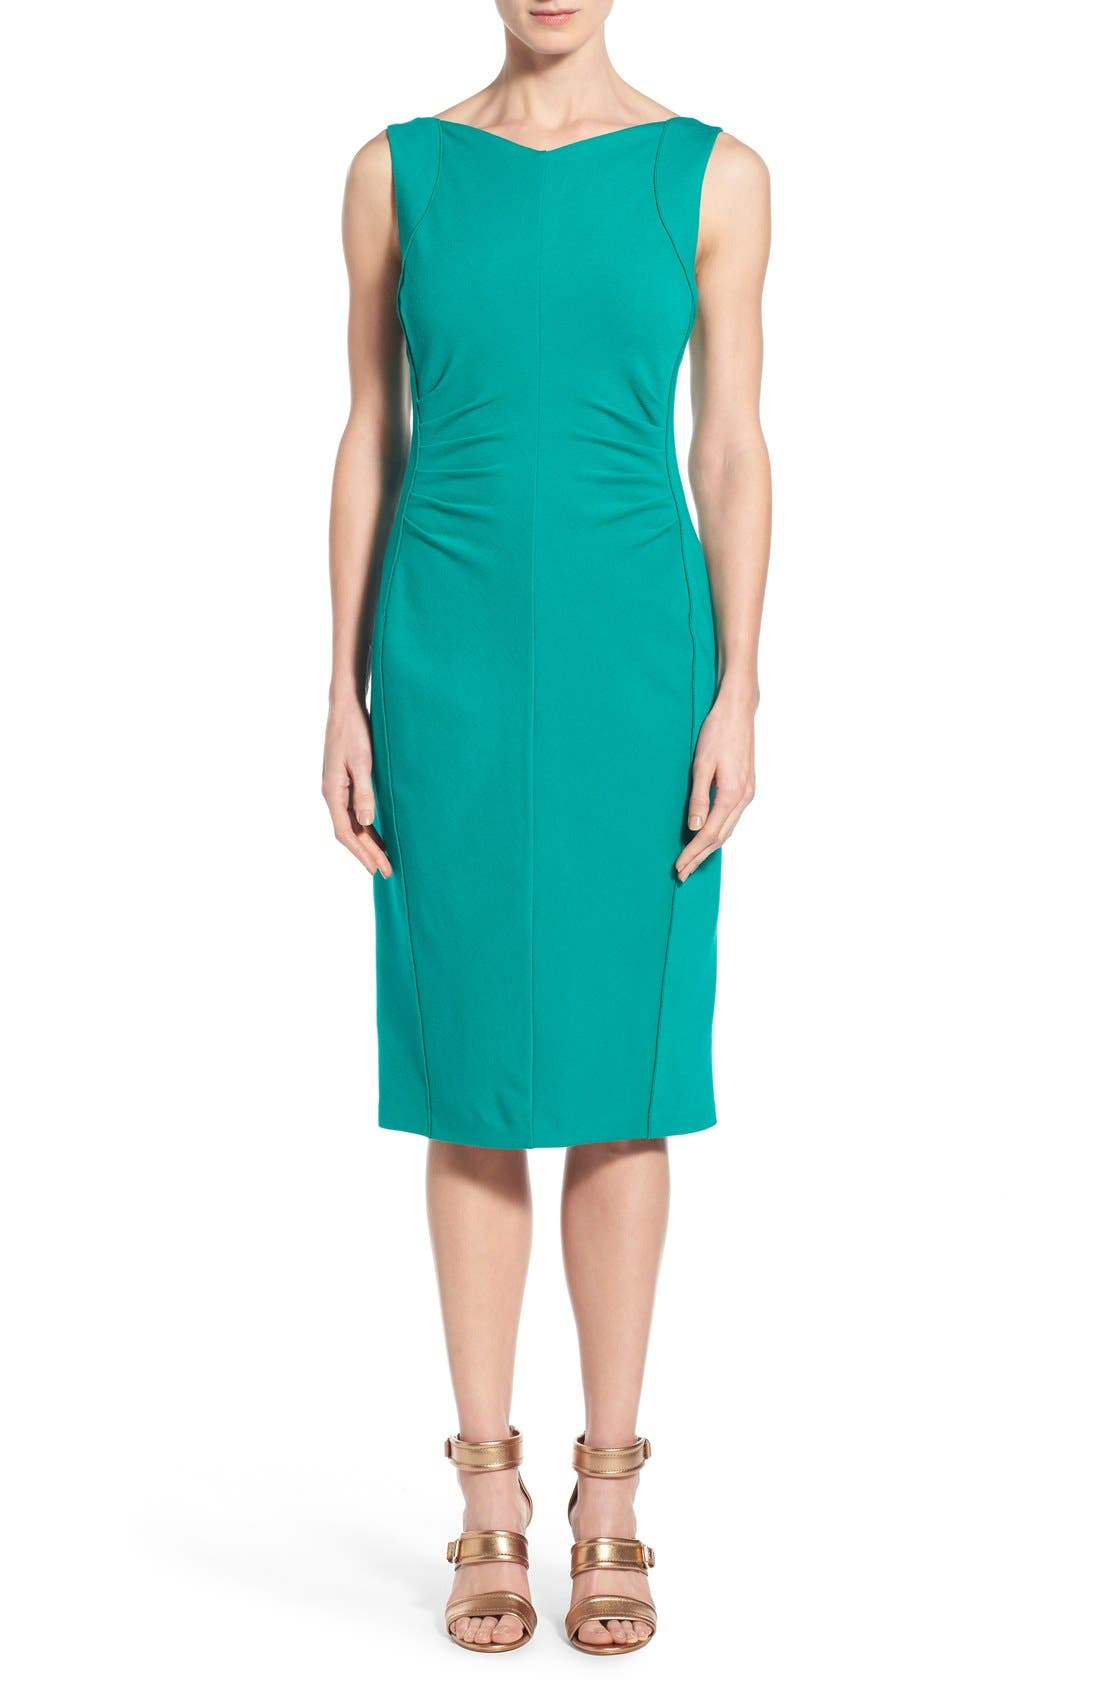 Alternate Image 1 Selected - Kobi Halperin 'Amina' Sheath Dress